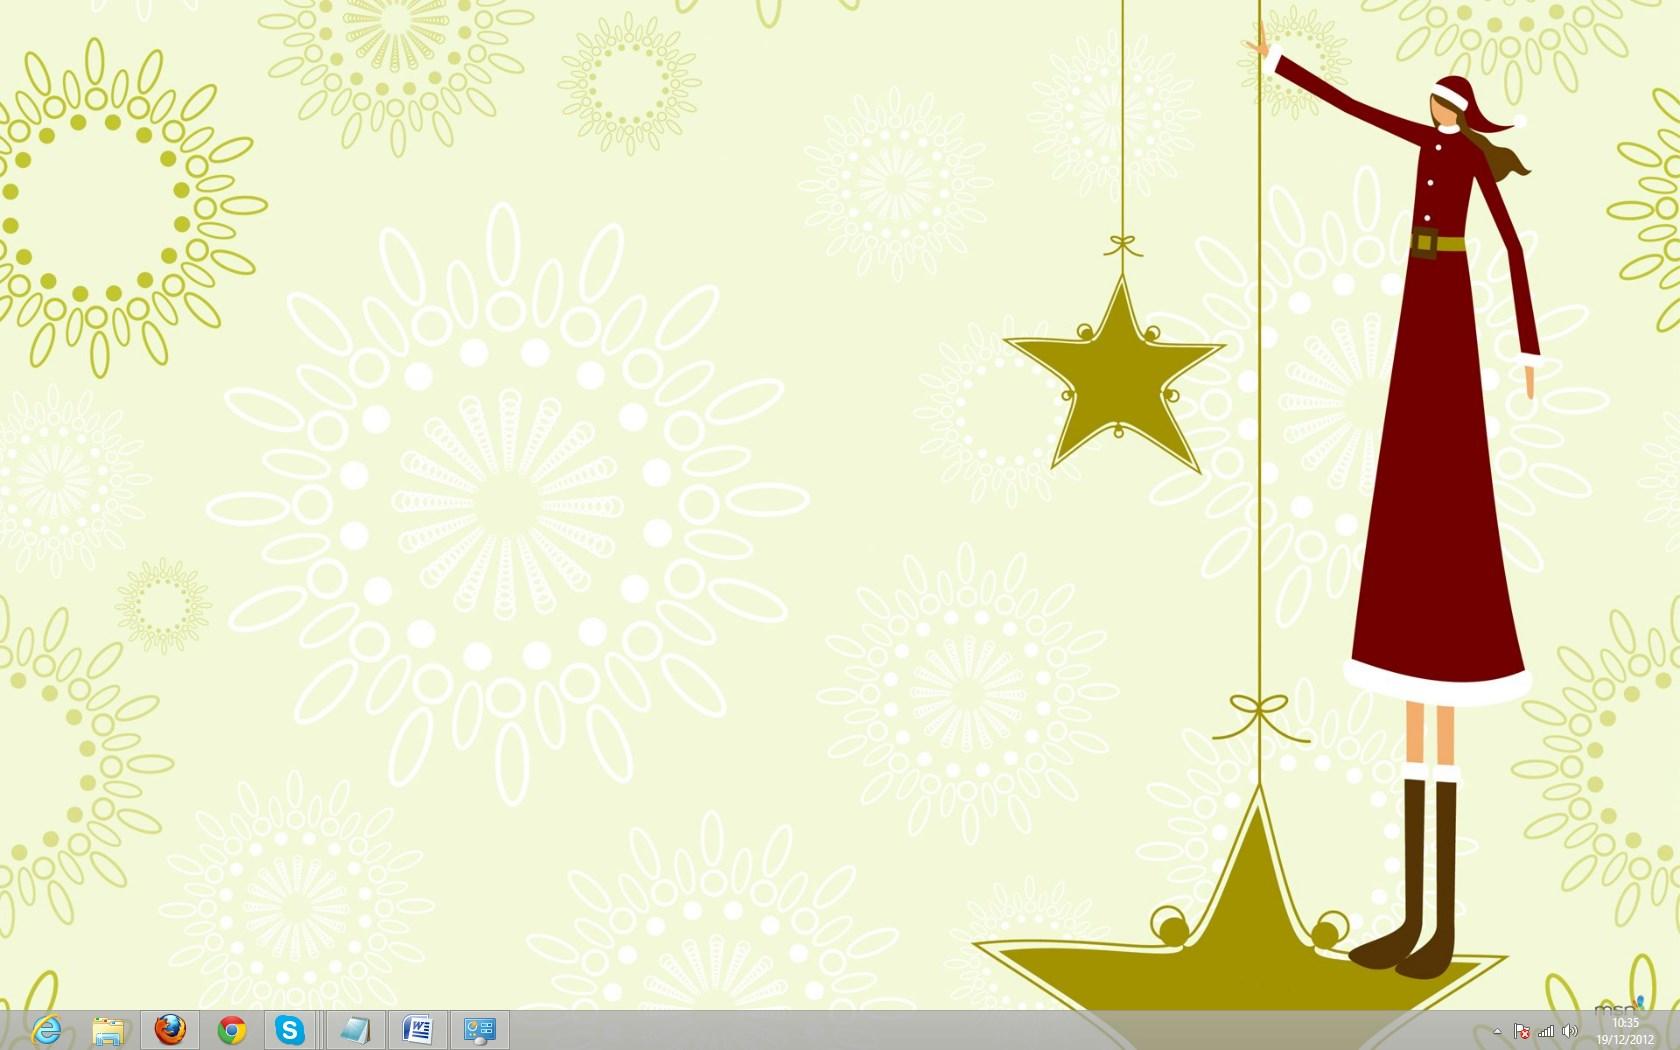 MSN Wallpaper and Screensaver Pack 2012 Holidays download   Baixaki 1680x1050